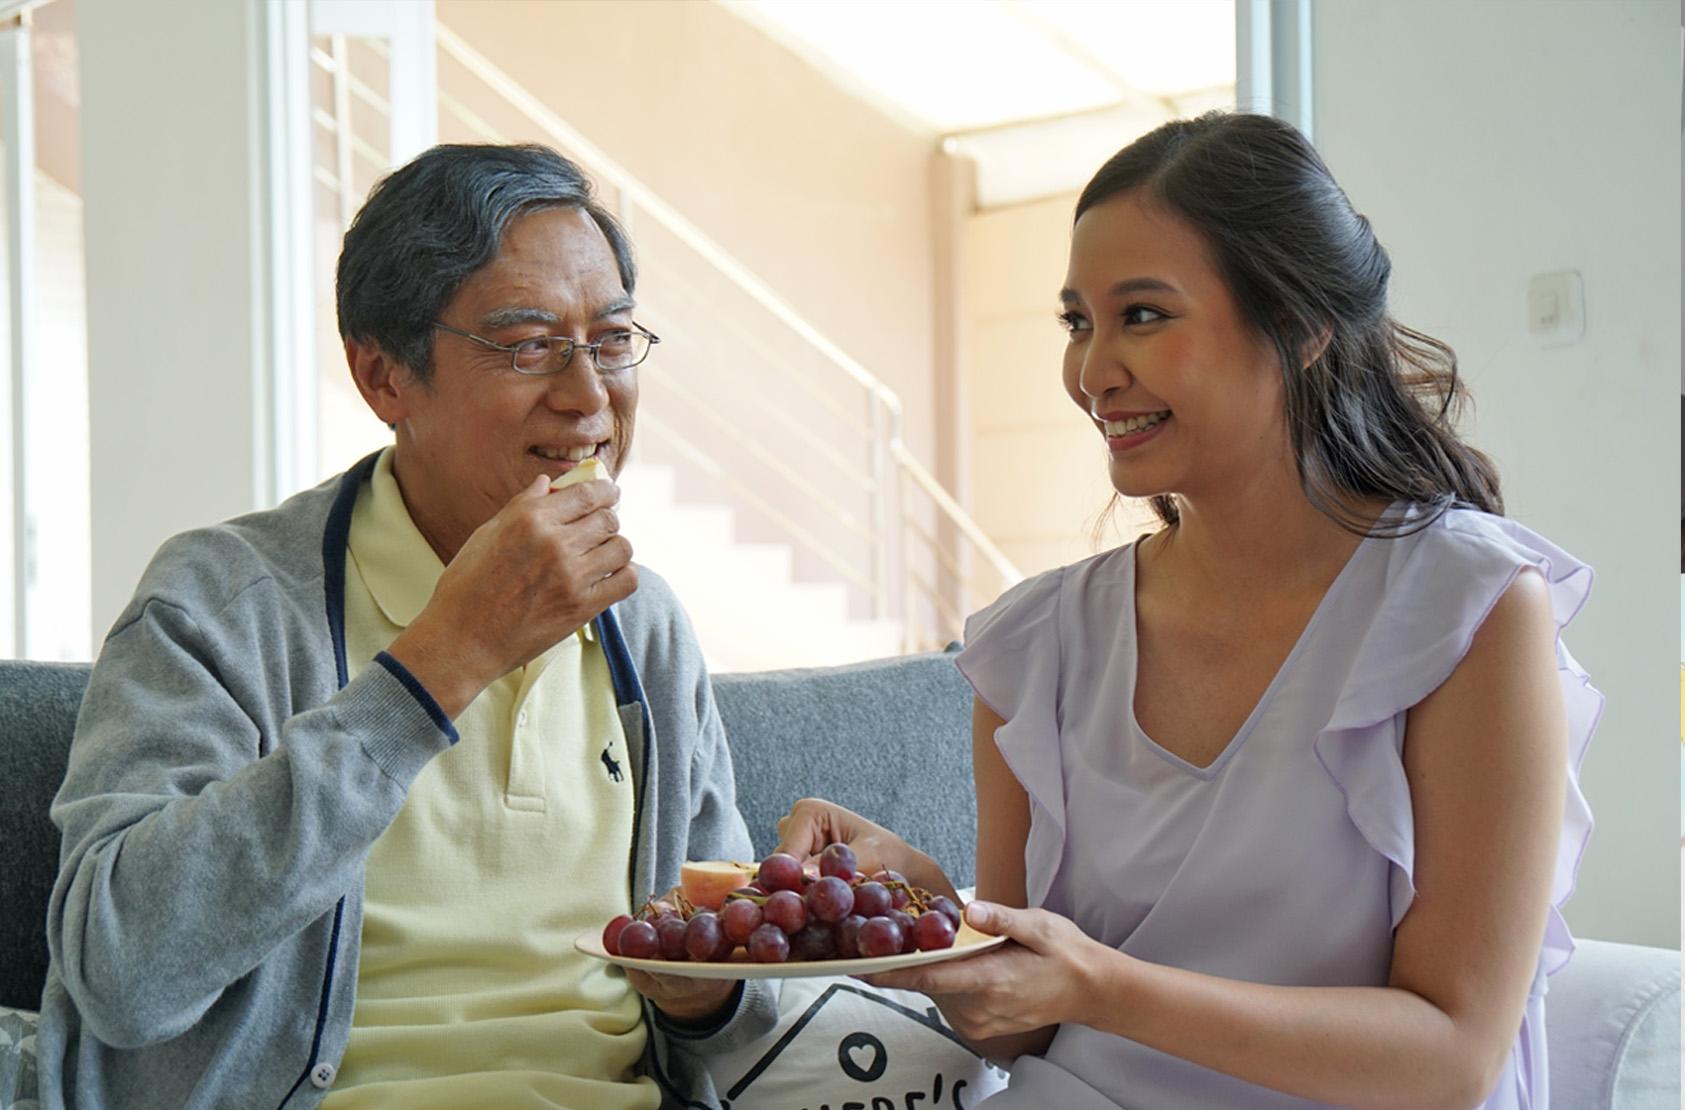 Pintar Memilih Makanan Supaya Kesayangan Tetap Sehat